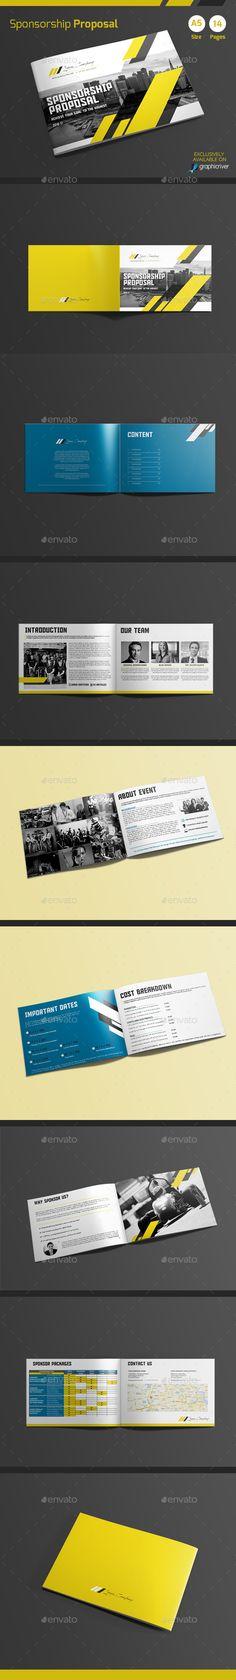 Sponsorship Proposal Template InDesign INDD. Download here: http://graphicriver.net/item/sponsorship-proposal/15638330?ref=ksioks